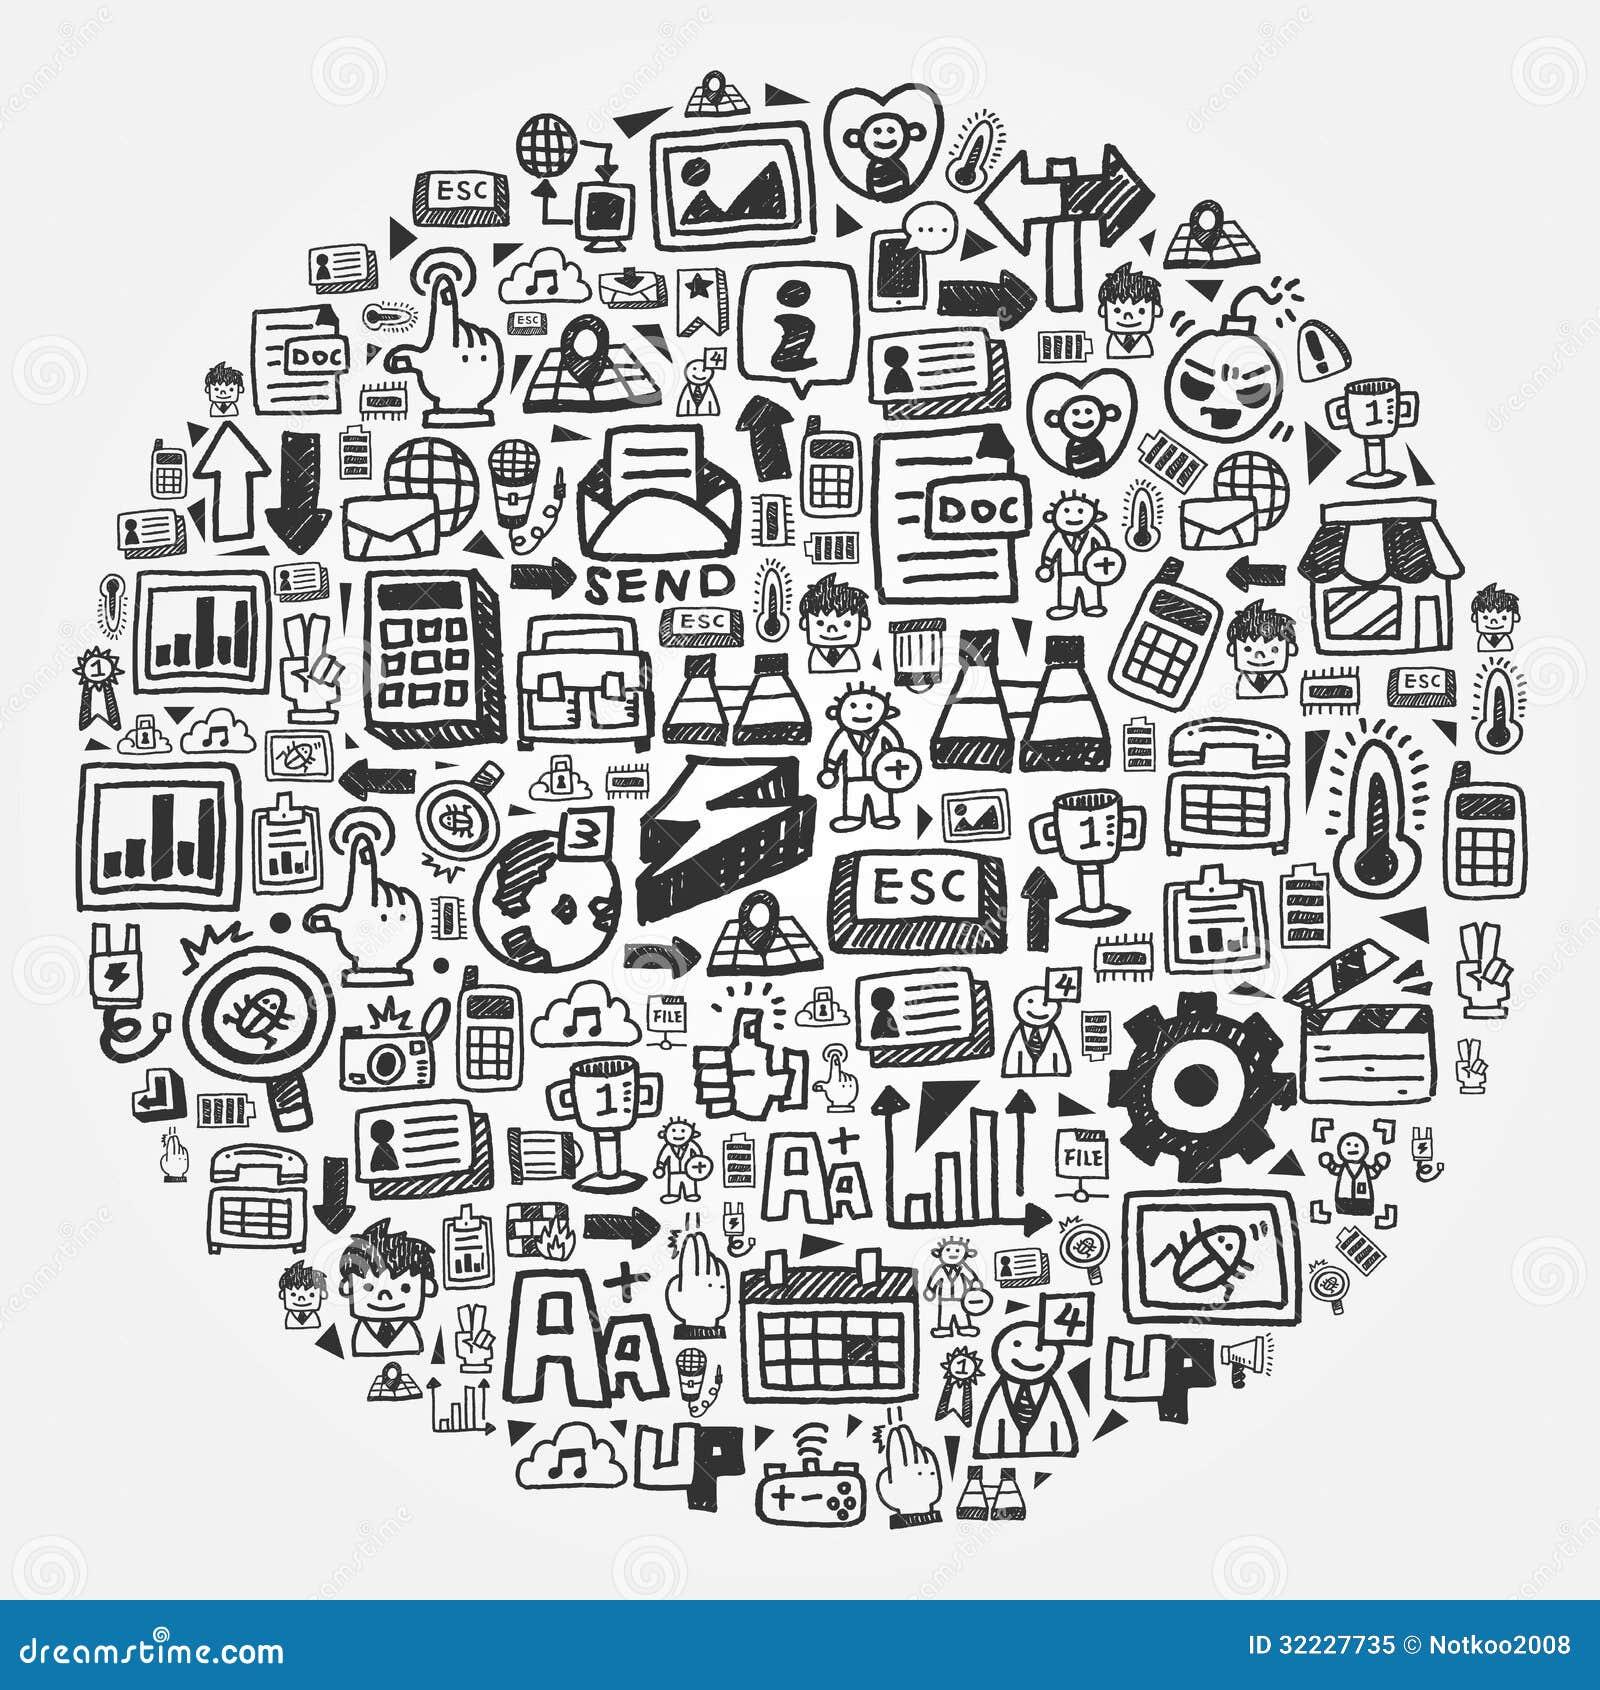 Vector Illustration Web Designs: Web Circle Royalty Free Stock Photo